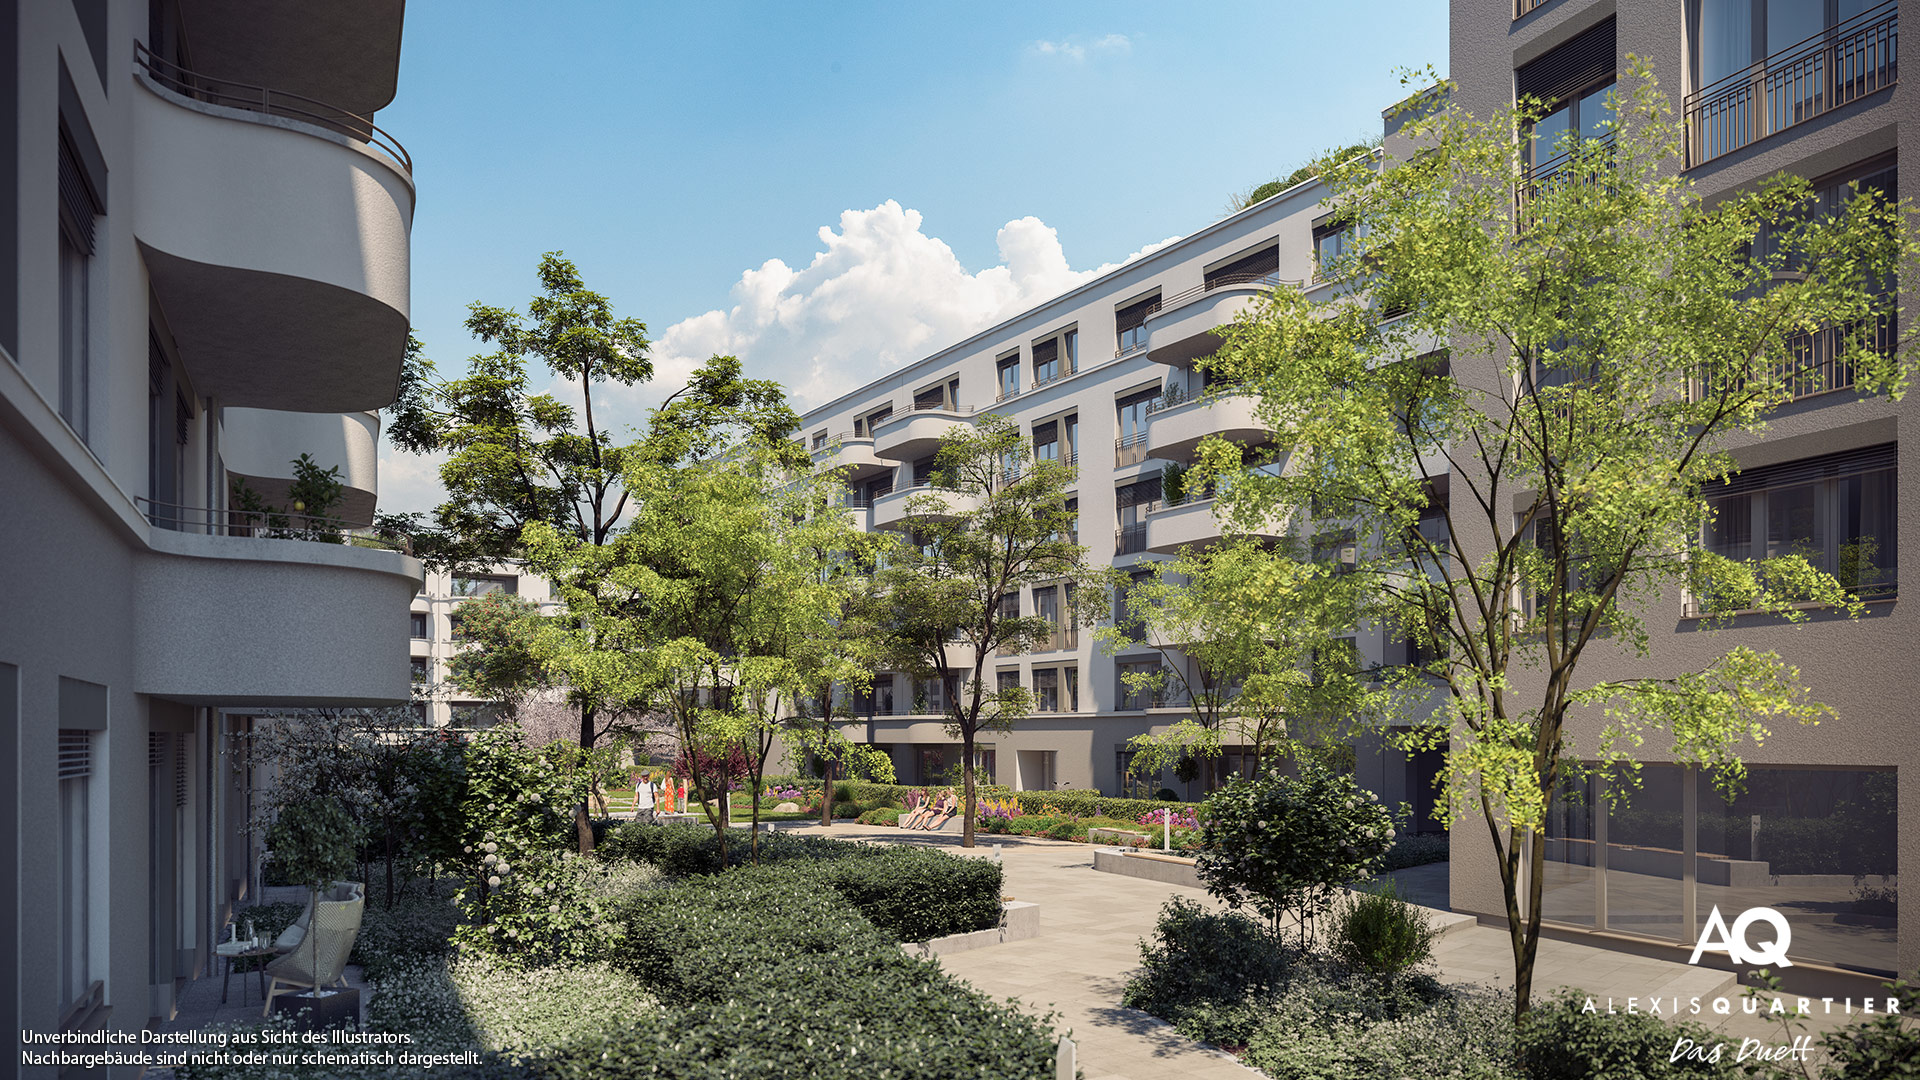 Immobilie Alexisquartier - Das Duett - Illustration 6